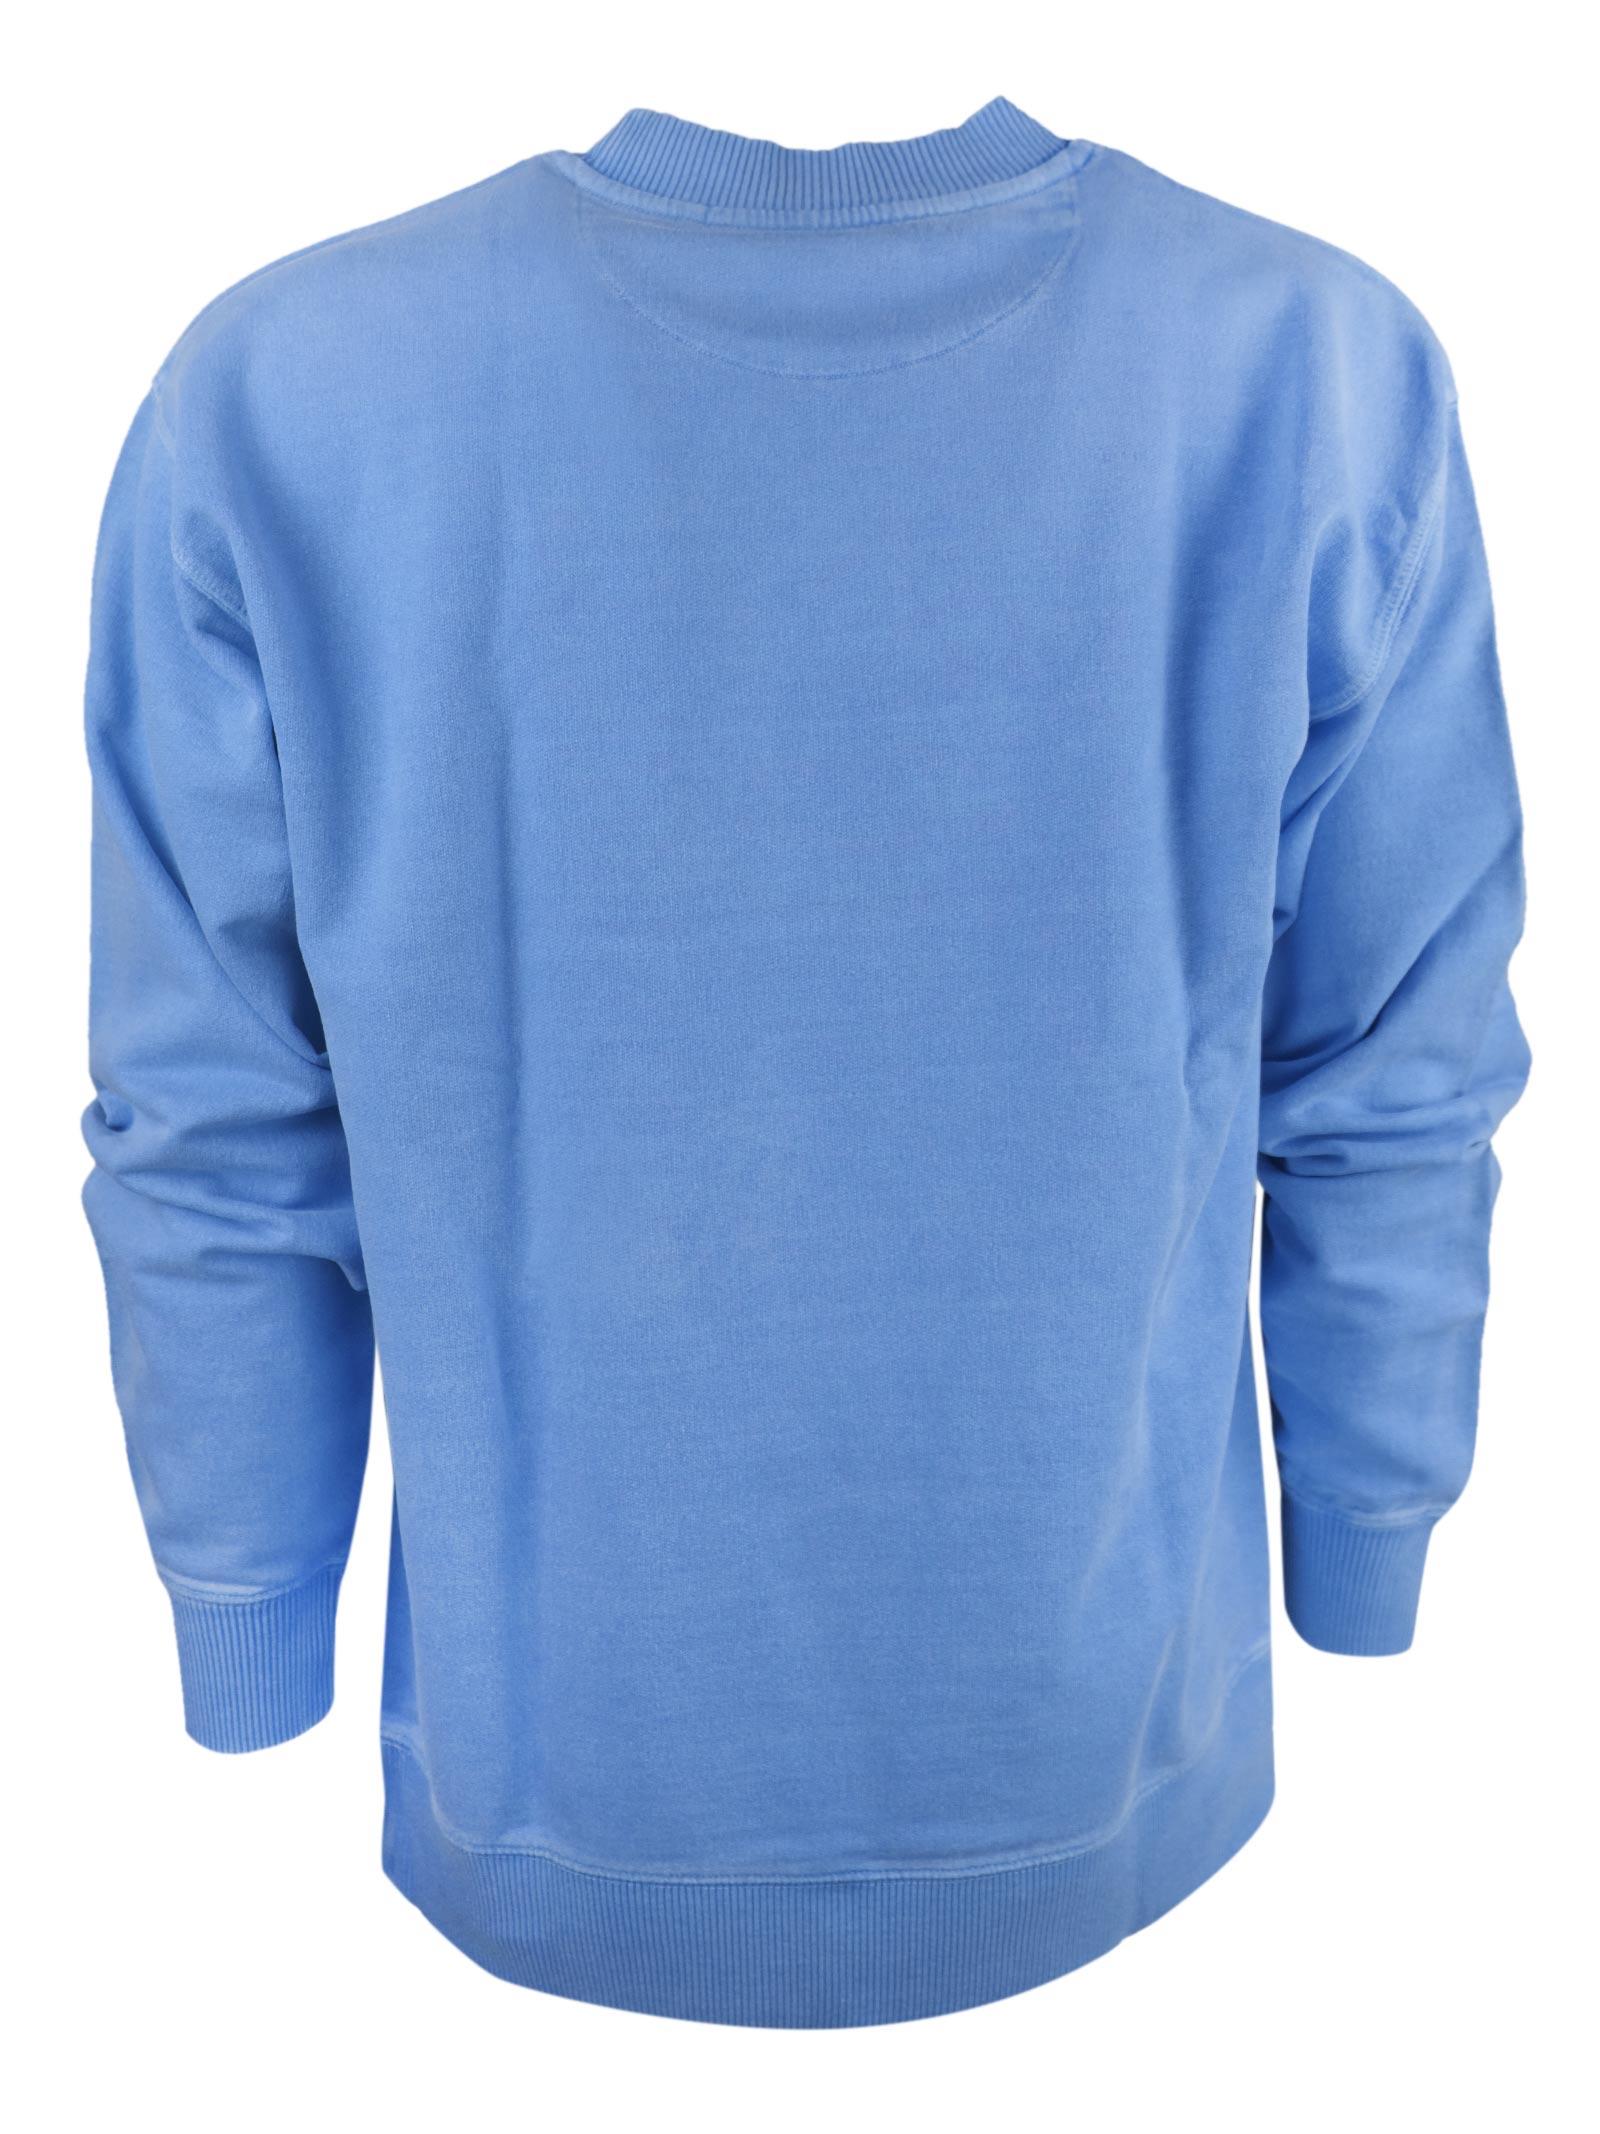 Crew neck sweater GANT | Sweats | 2046081445